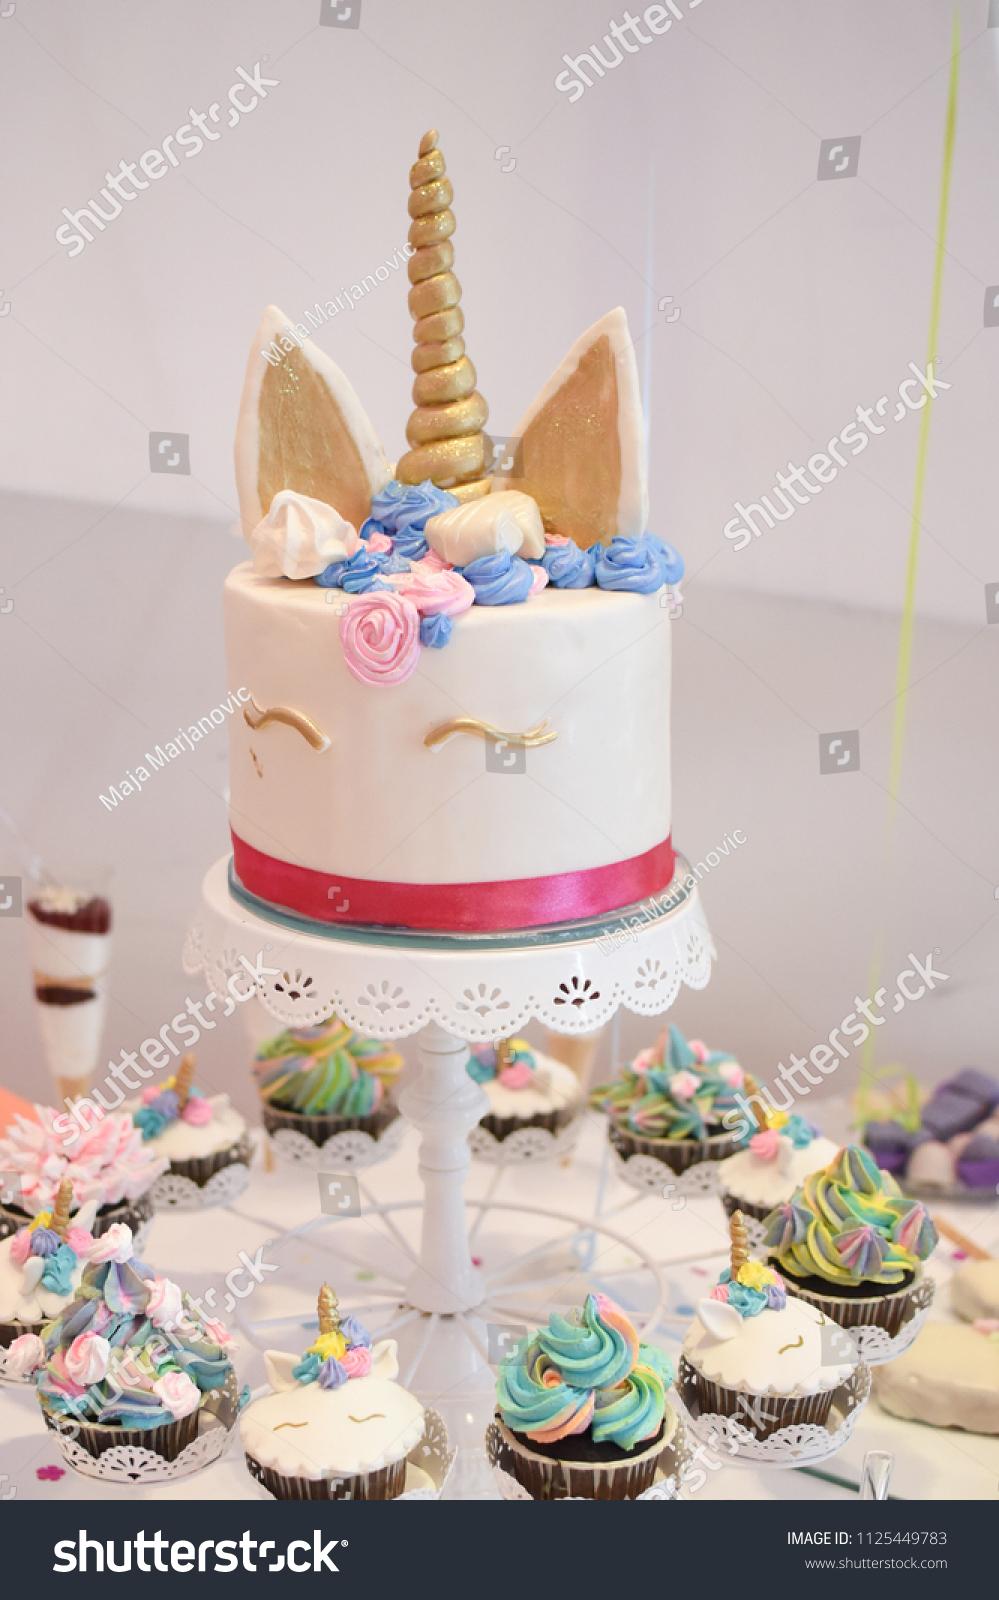 Peachy Sweet Table Big Cake First Birthday Stock Photo Edit Now 1125449783 Funny Birthday Cards Online Elaedamsfinfo